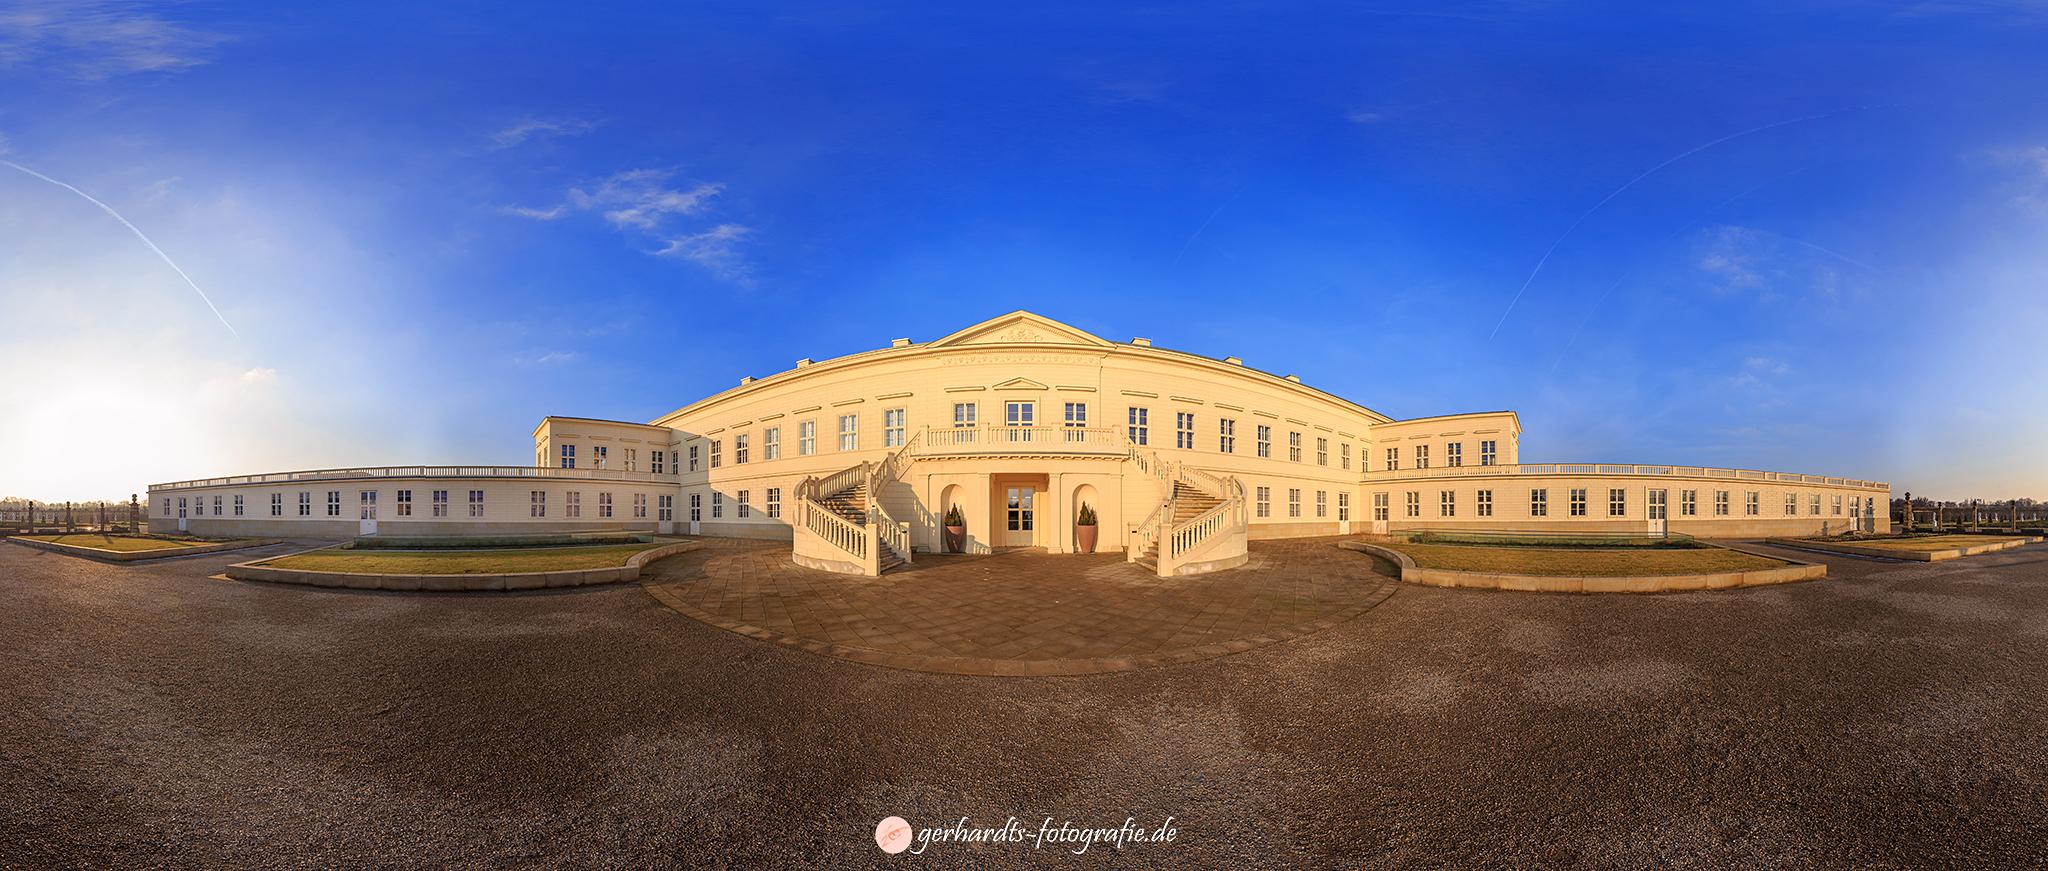 360 Grad Panoramafotos Herrenhäuser Gärten Hannover Schloss Herrenhausen